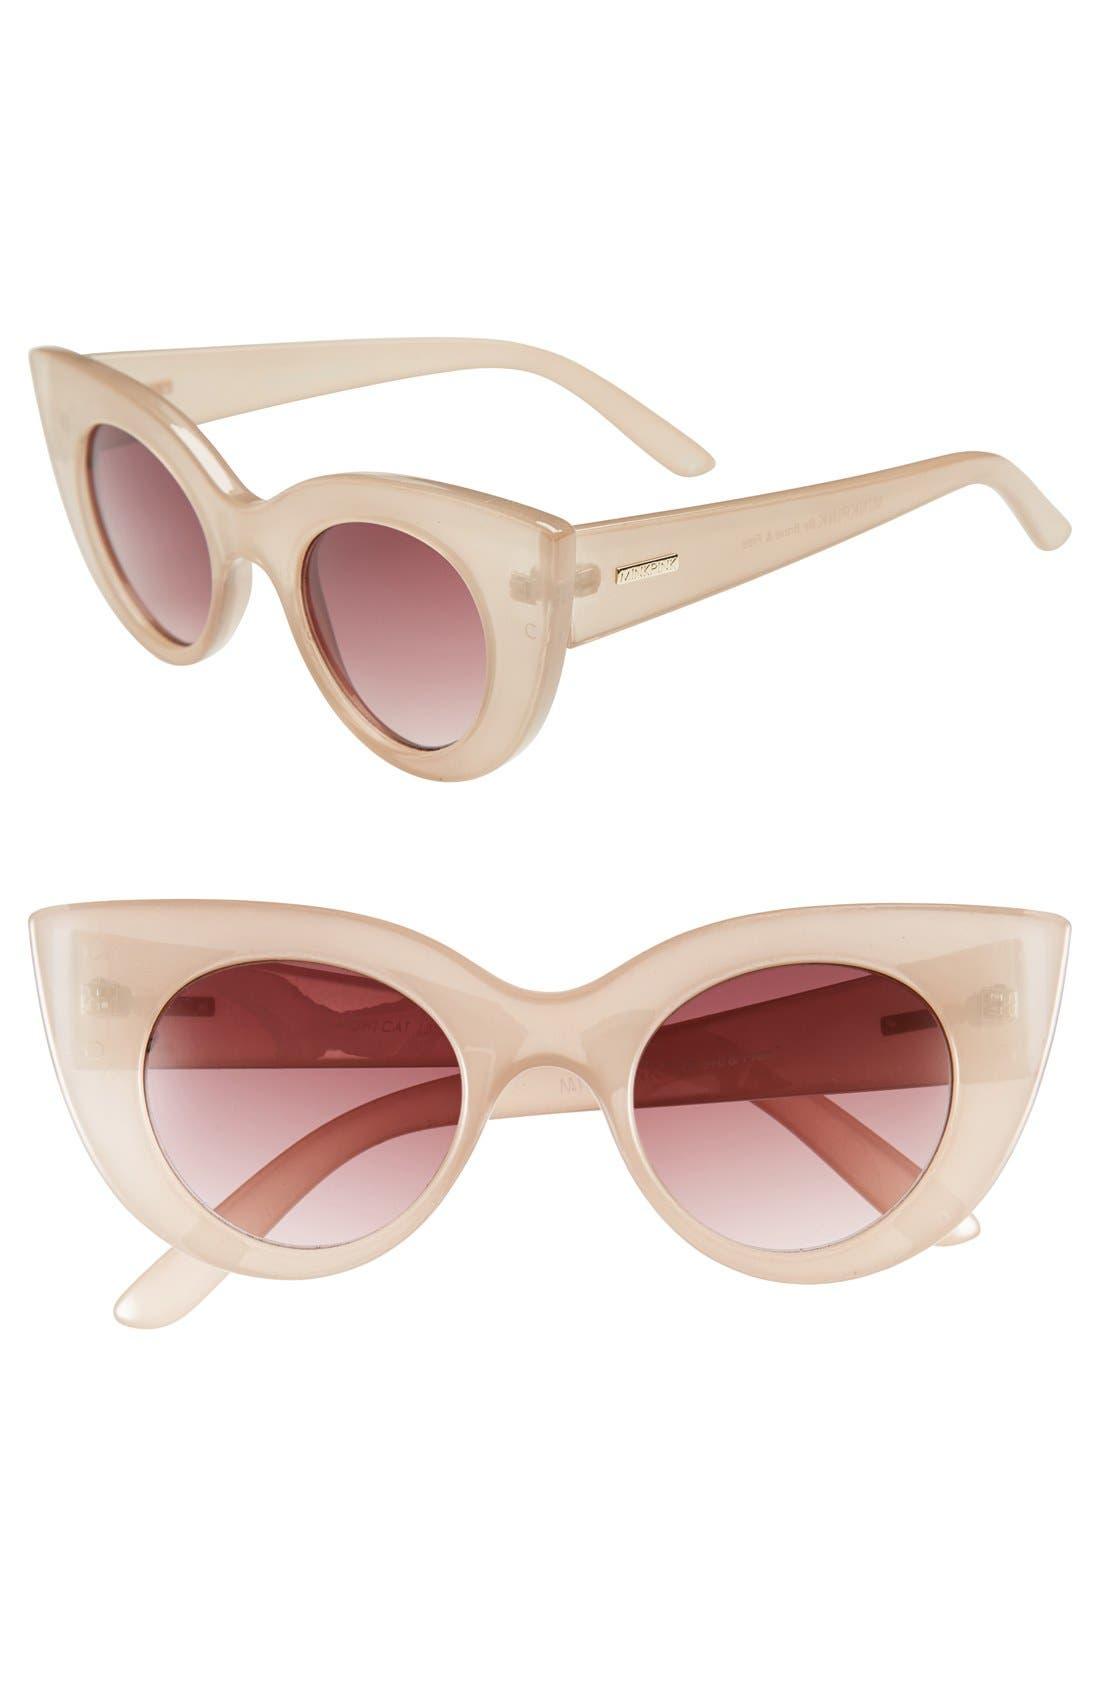 Alternate Image 1 Selected - MINKPINK 'Love Cat' 44mm Sunglasses